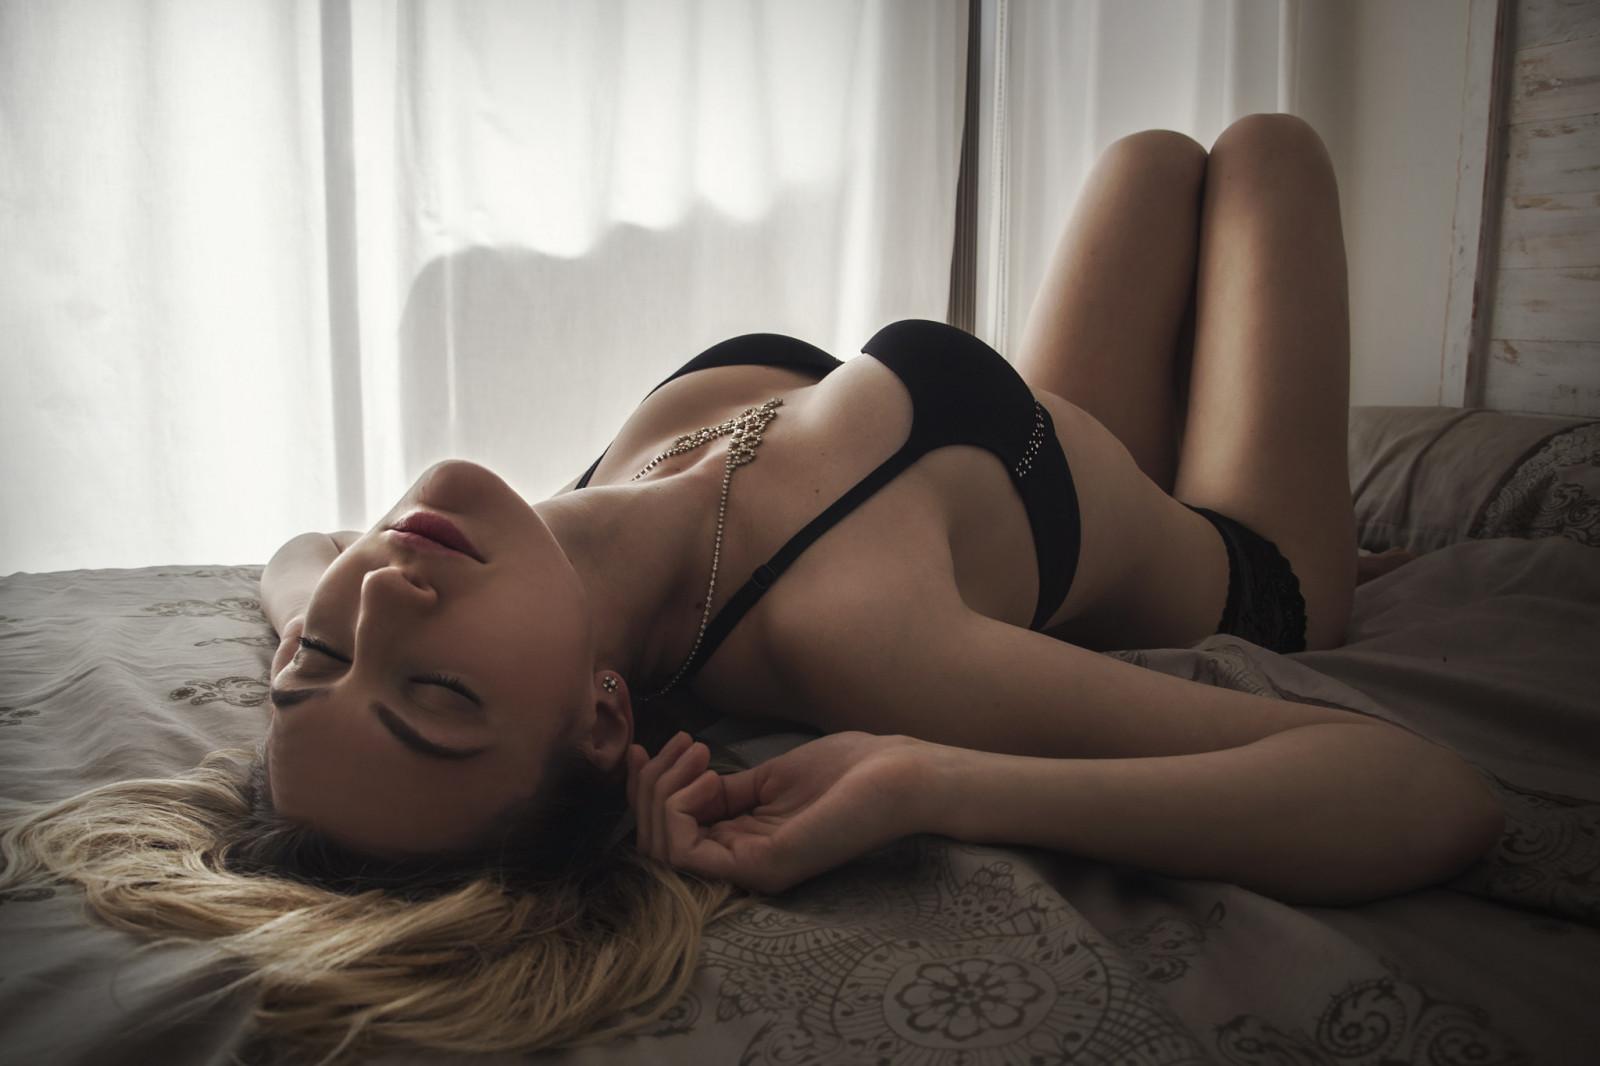 наташенька в экстазе на кровати